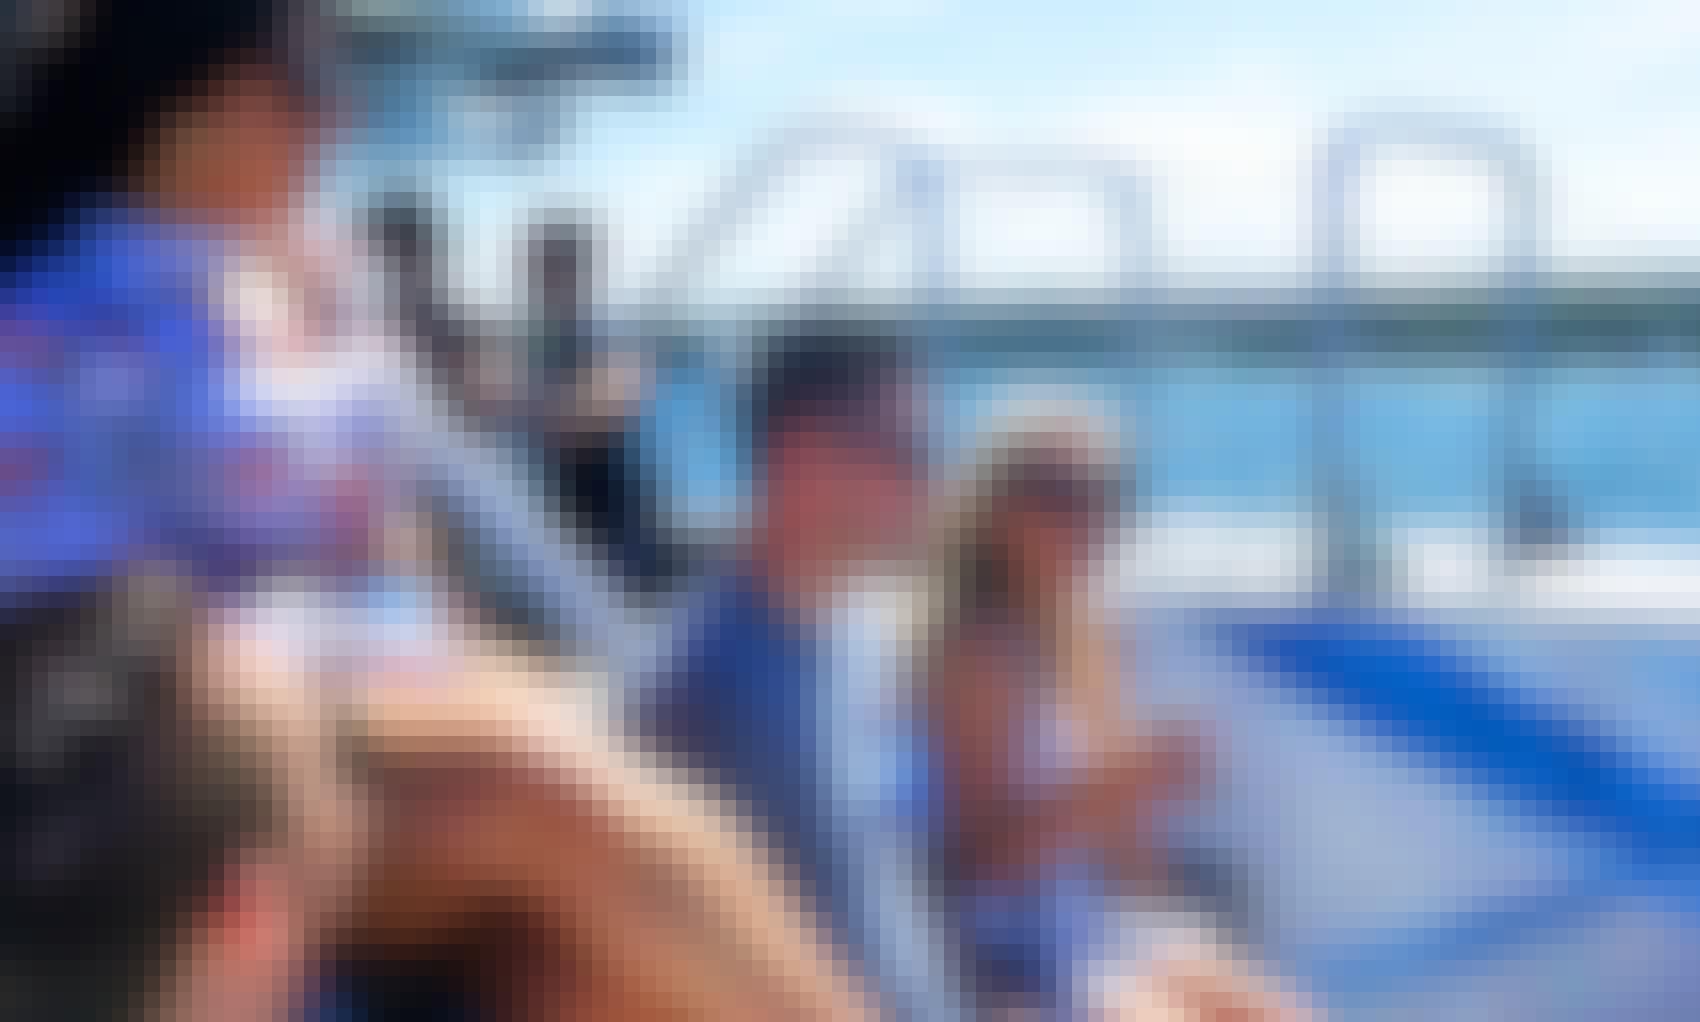 Australia Day Cruises onboard 41' Luxury Catamaran